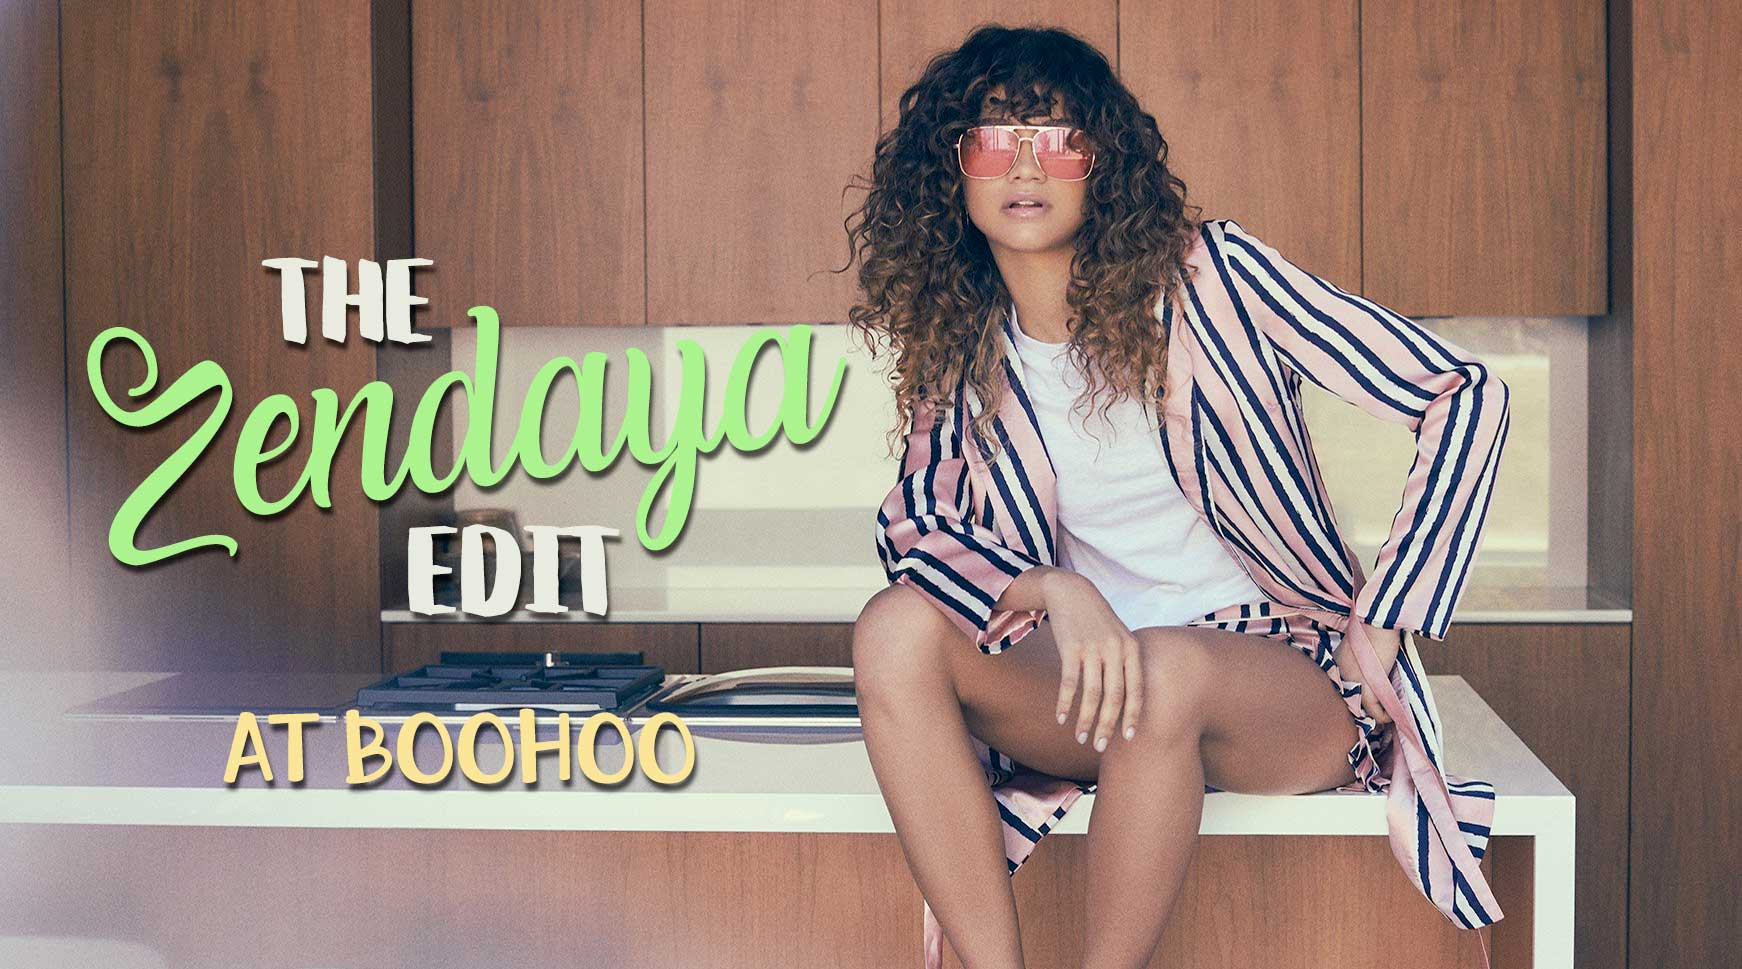 d297892090c07 Boohoo & Zendaya Revived the 90s with The Zendaya Edit • Broke and Beautiful